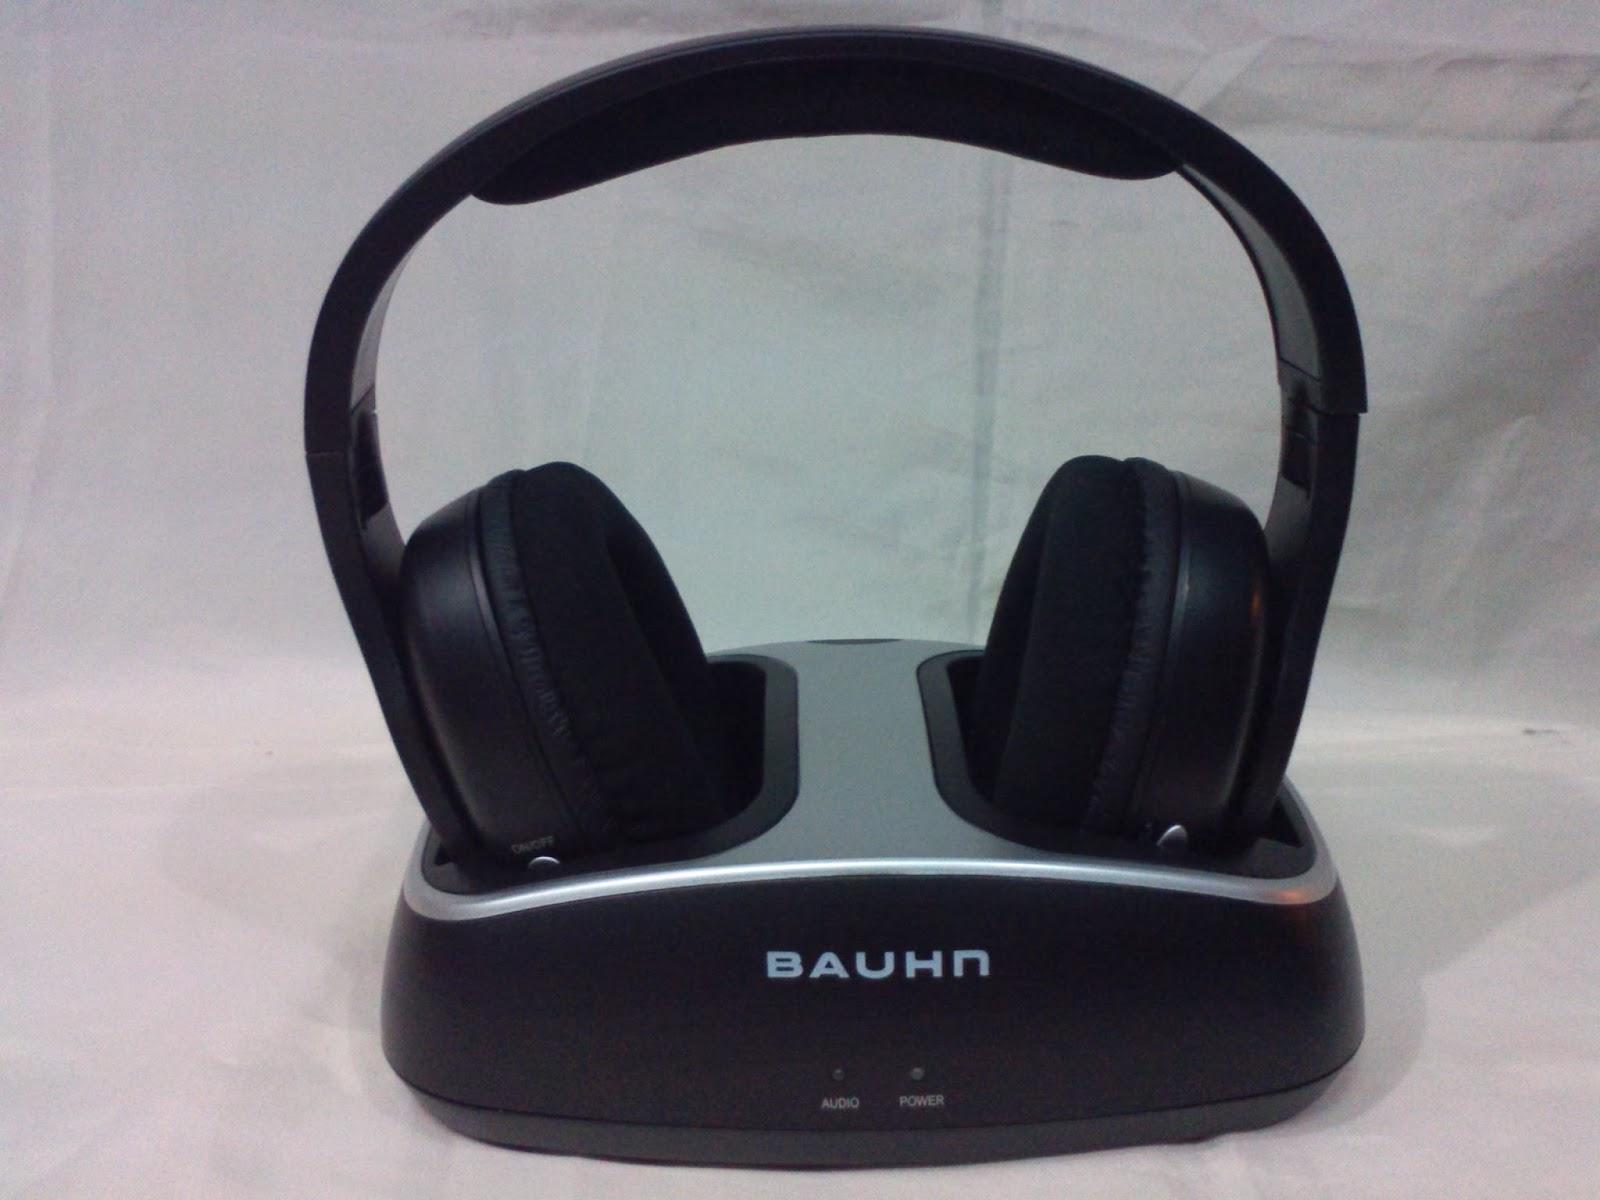 bauhn wireless headphones instructions